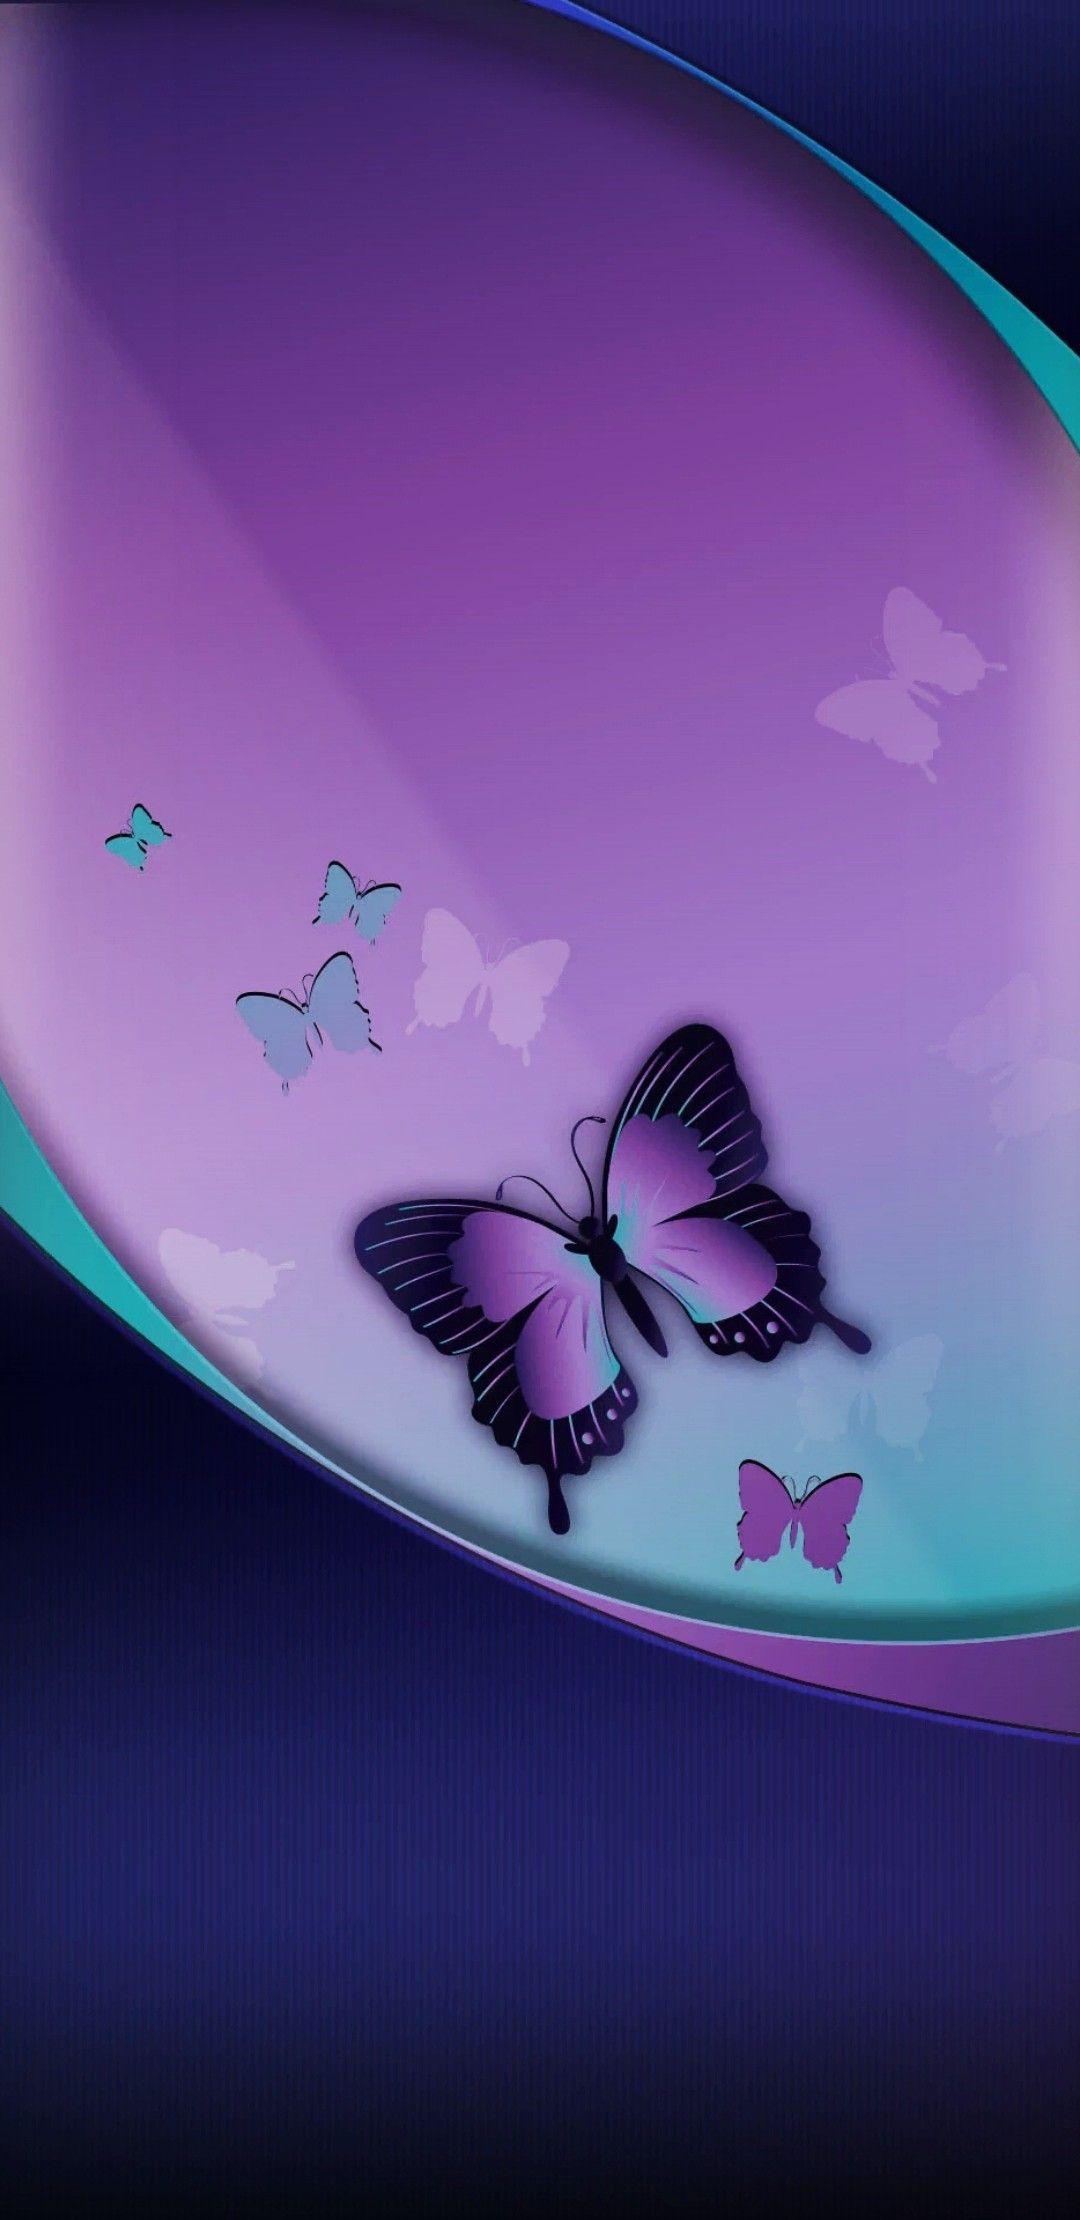 Wallpaper Butterfly Wallpaper Backgrounds Butterfly Wallpaper Wallpaper Iphone Cute